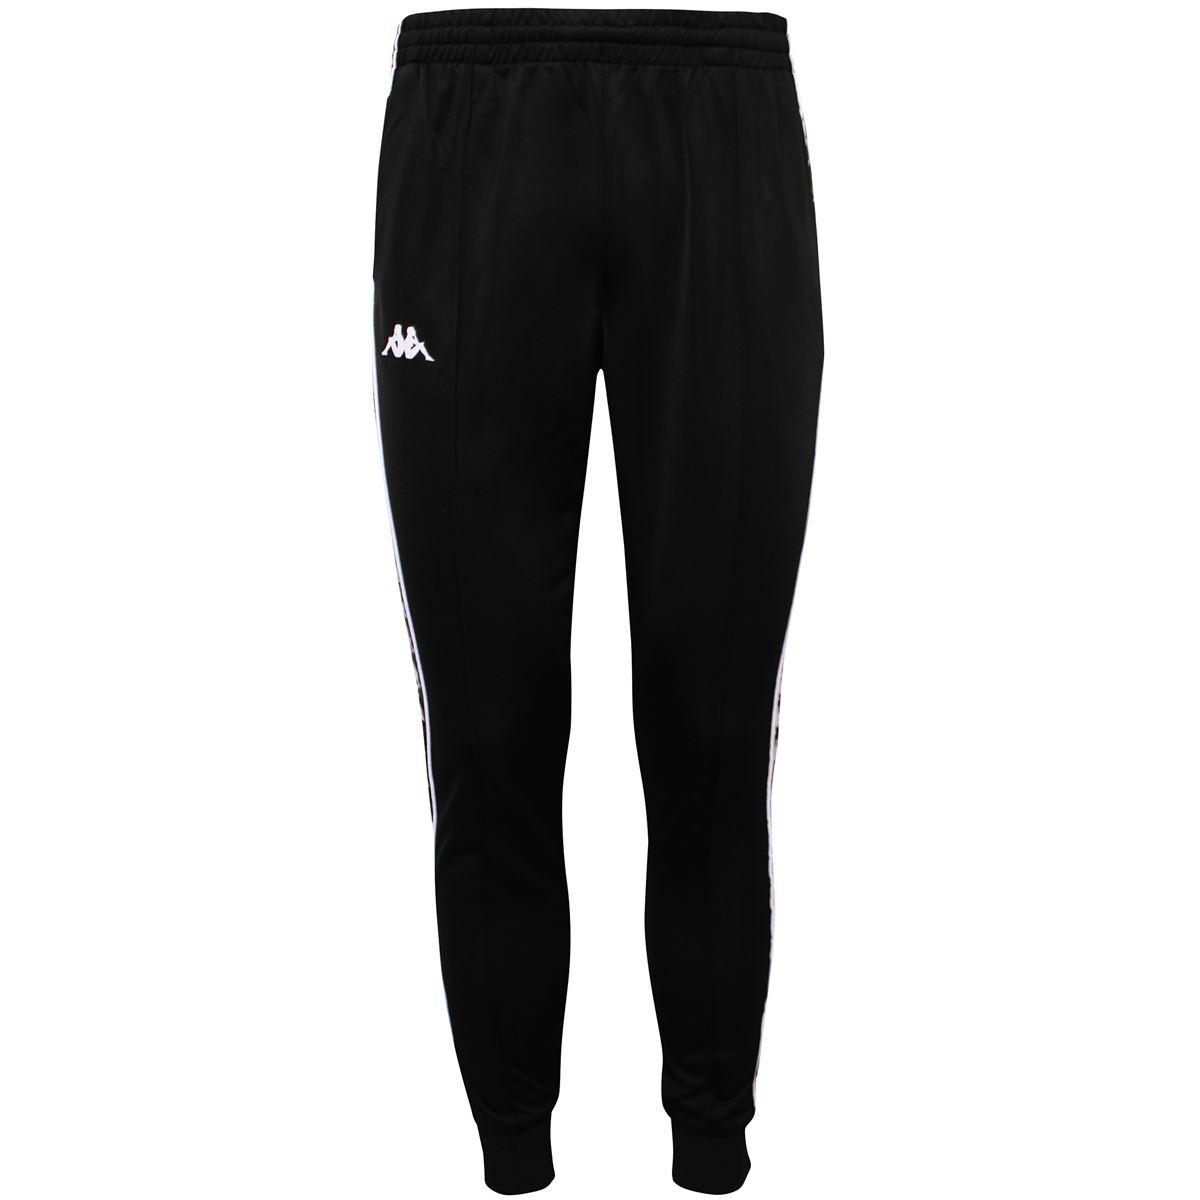 Pantalone da uomo in tricot garzato Kappa | Pantalone | 303KUC0A24 BLACK-WHITE